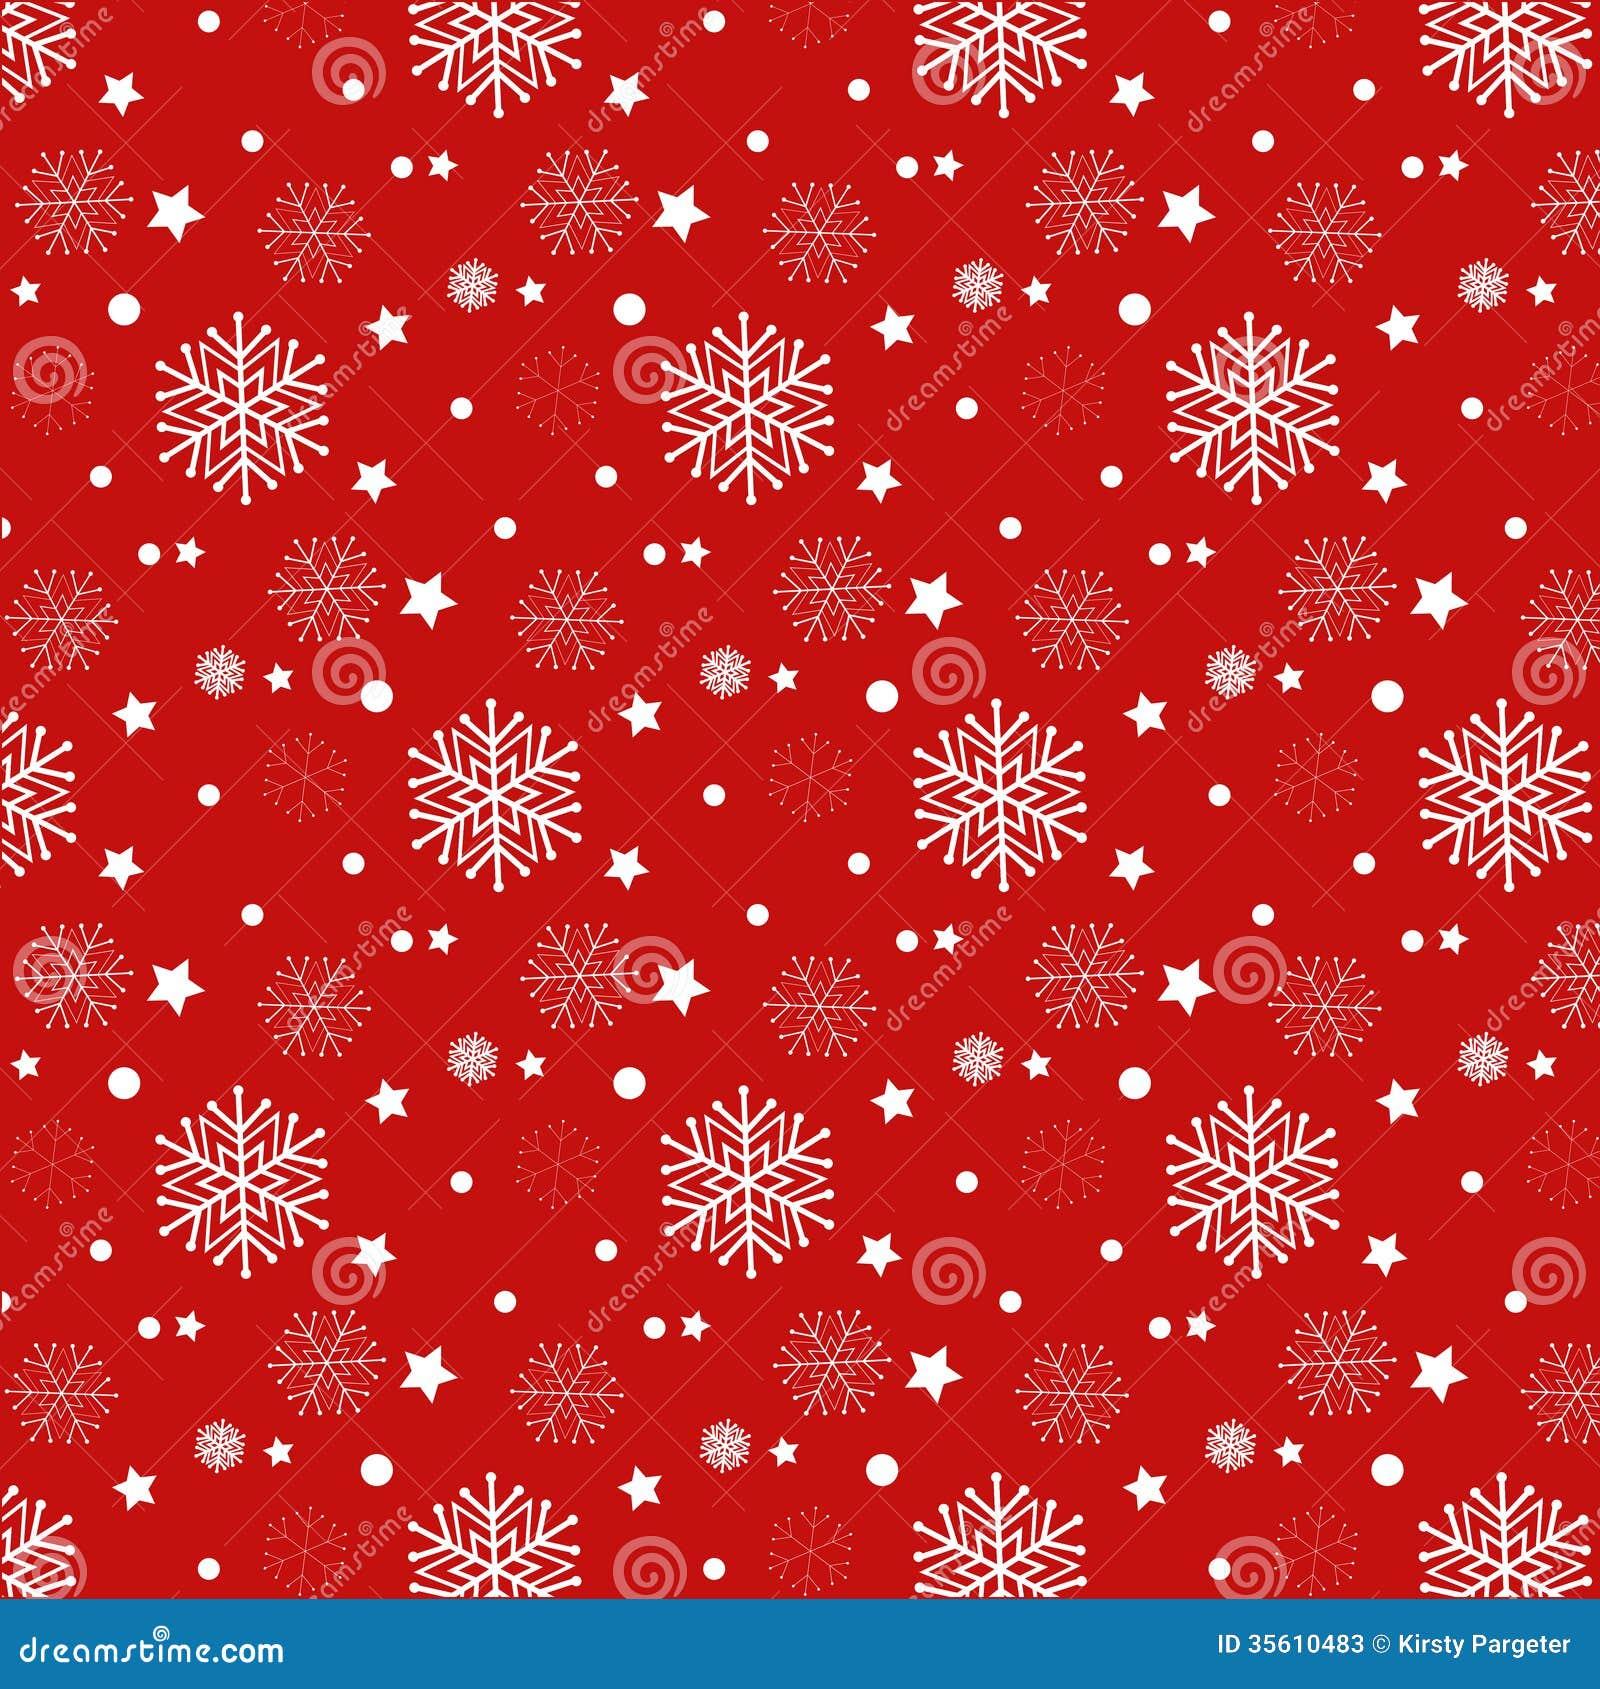 Christmas Snowflake Background Stock Photos - Image: 35610483